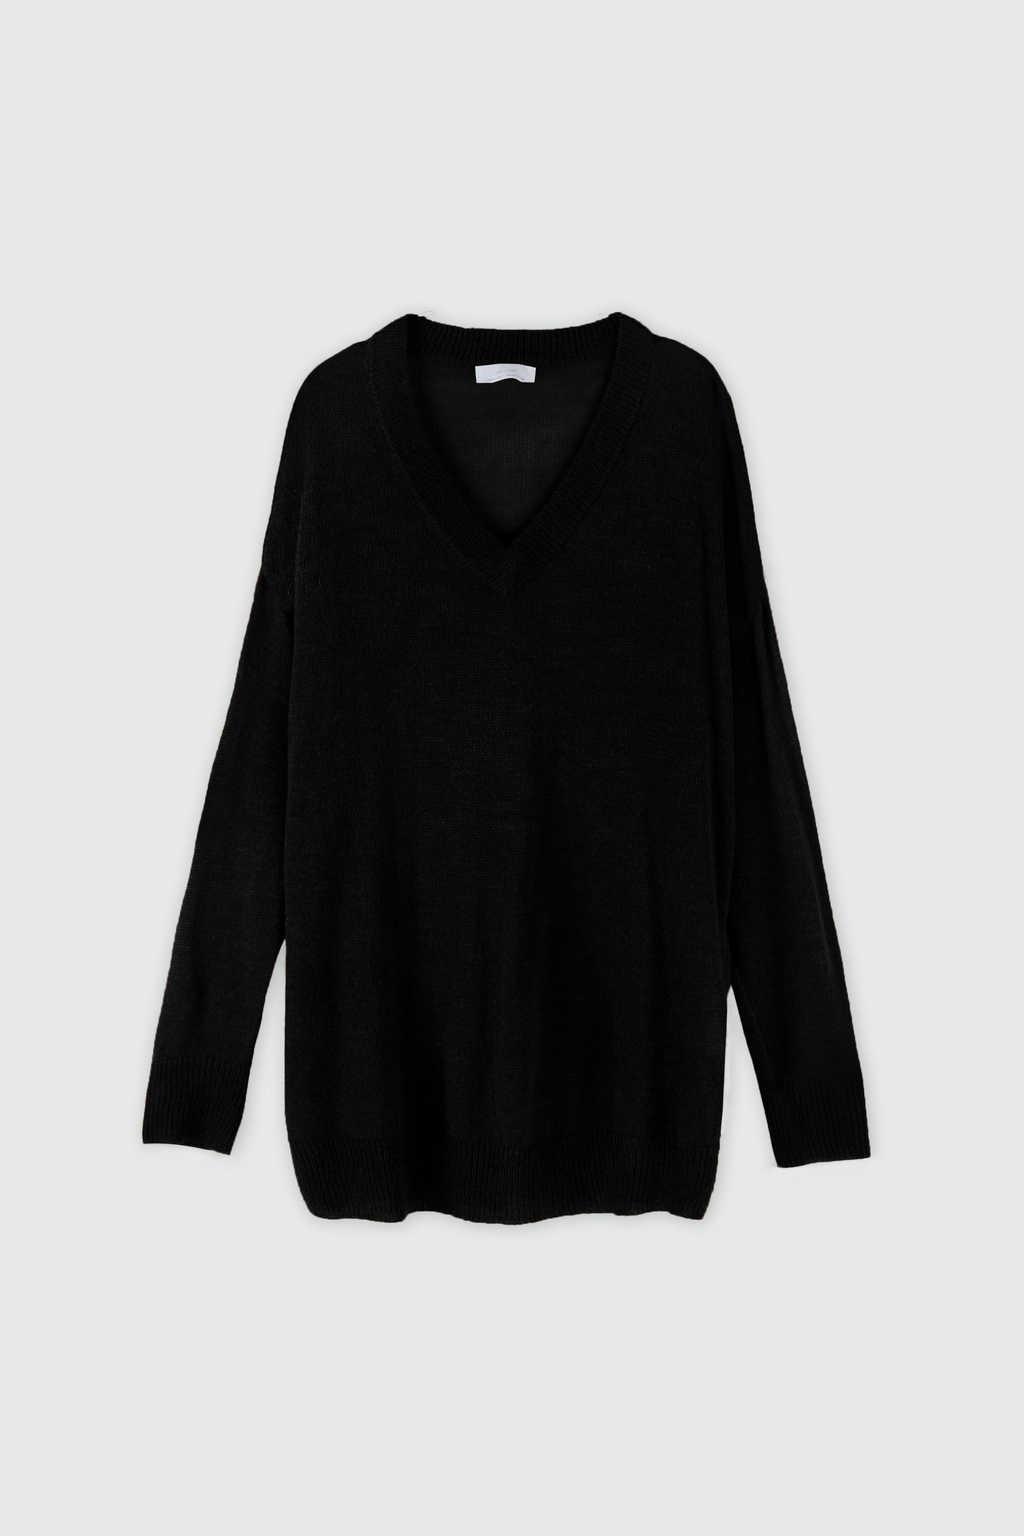 Sweater 2980 Black 13